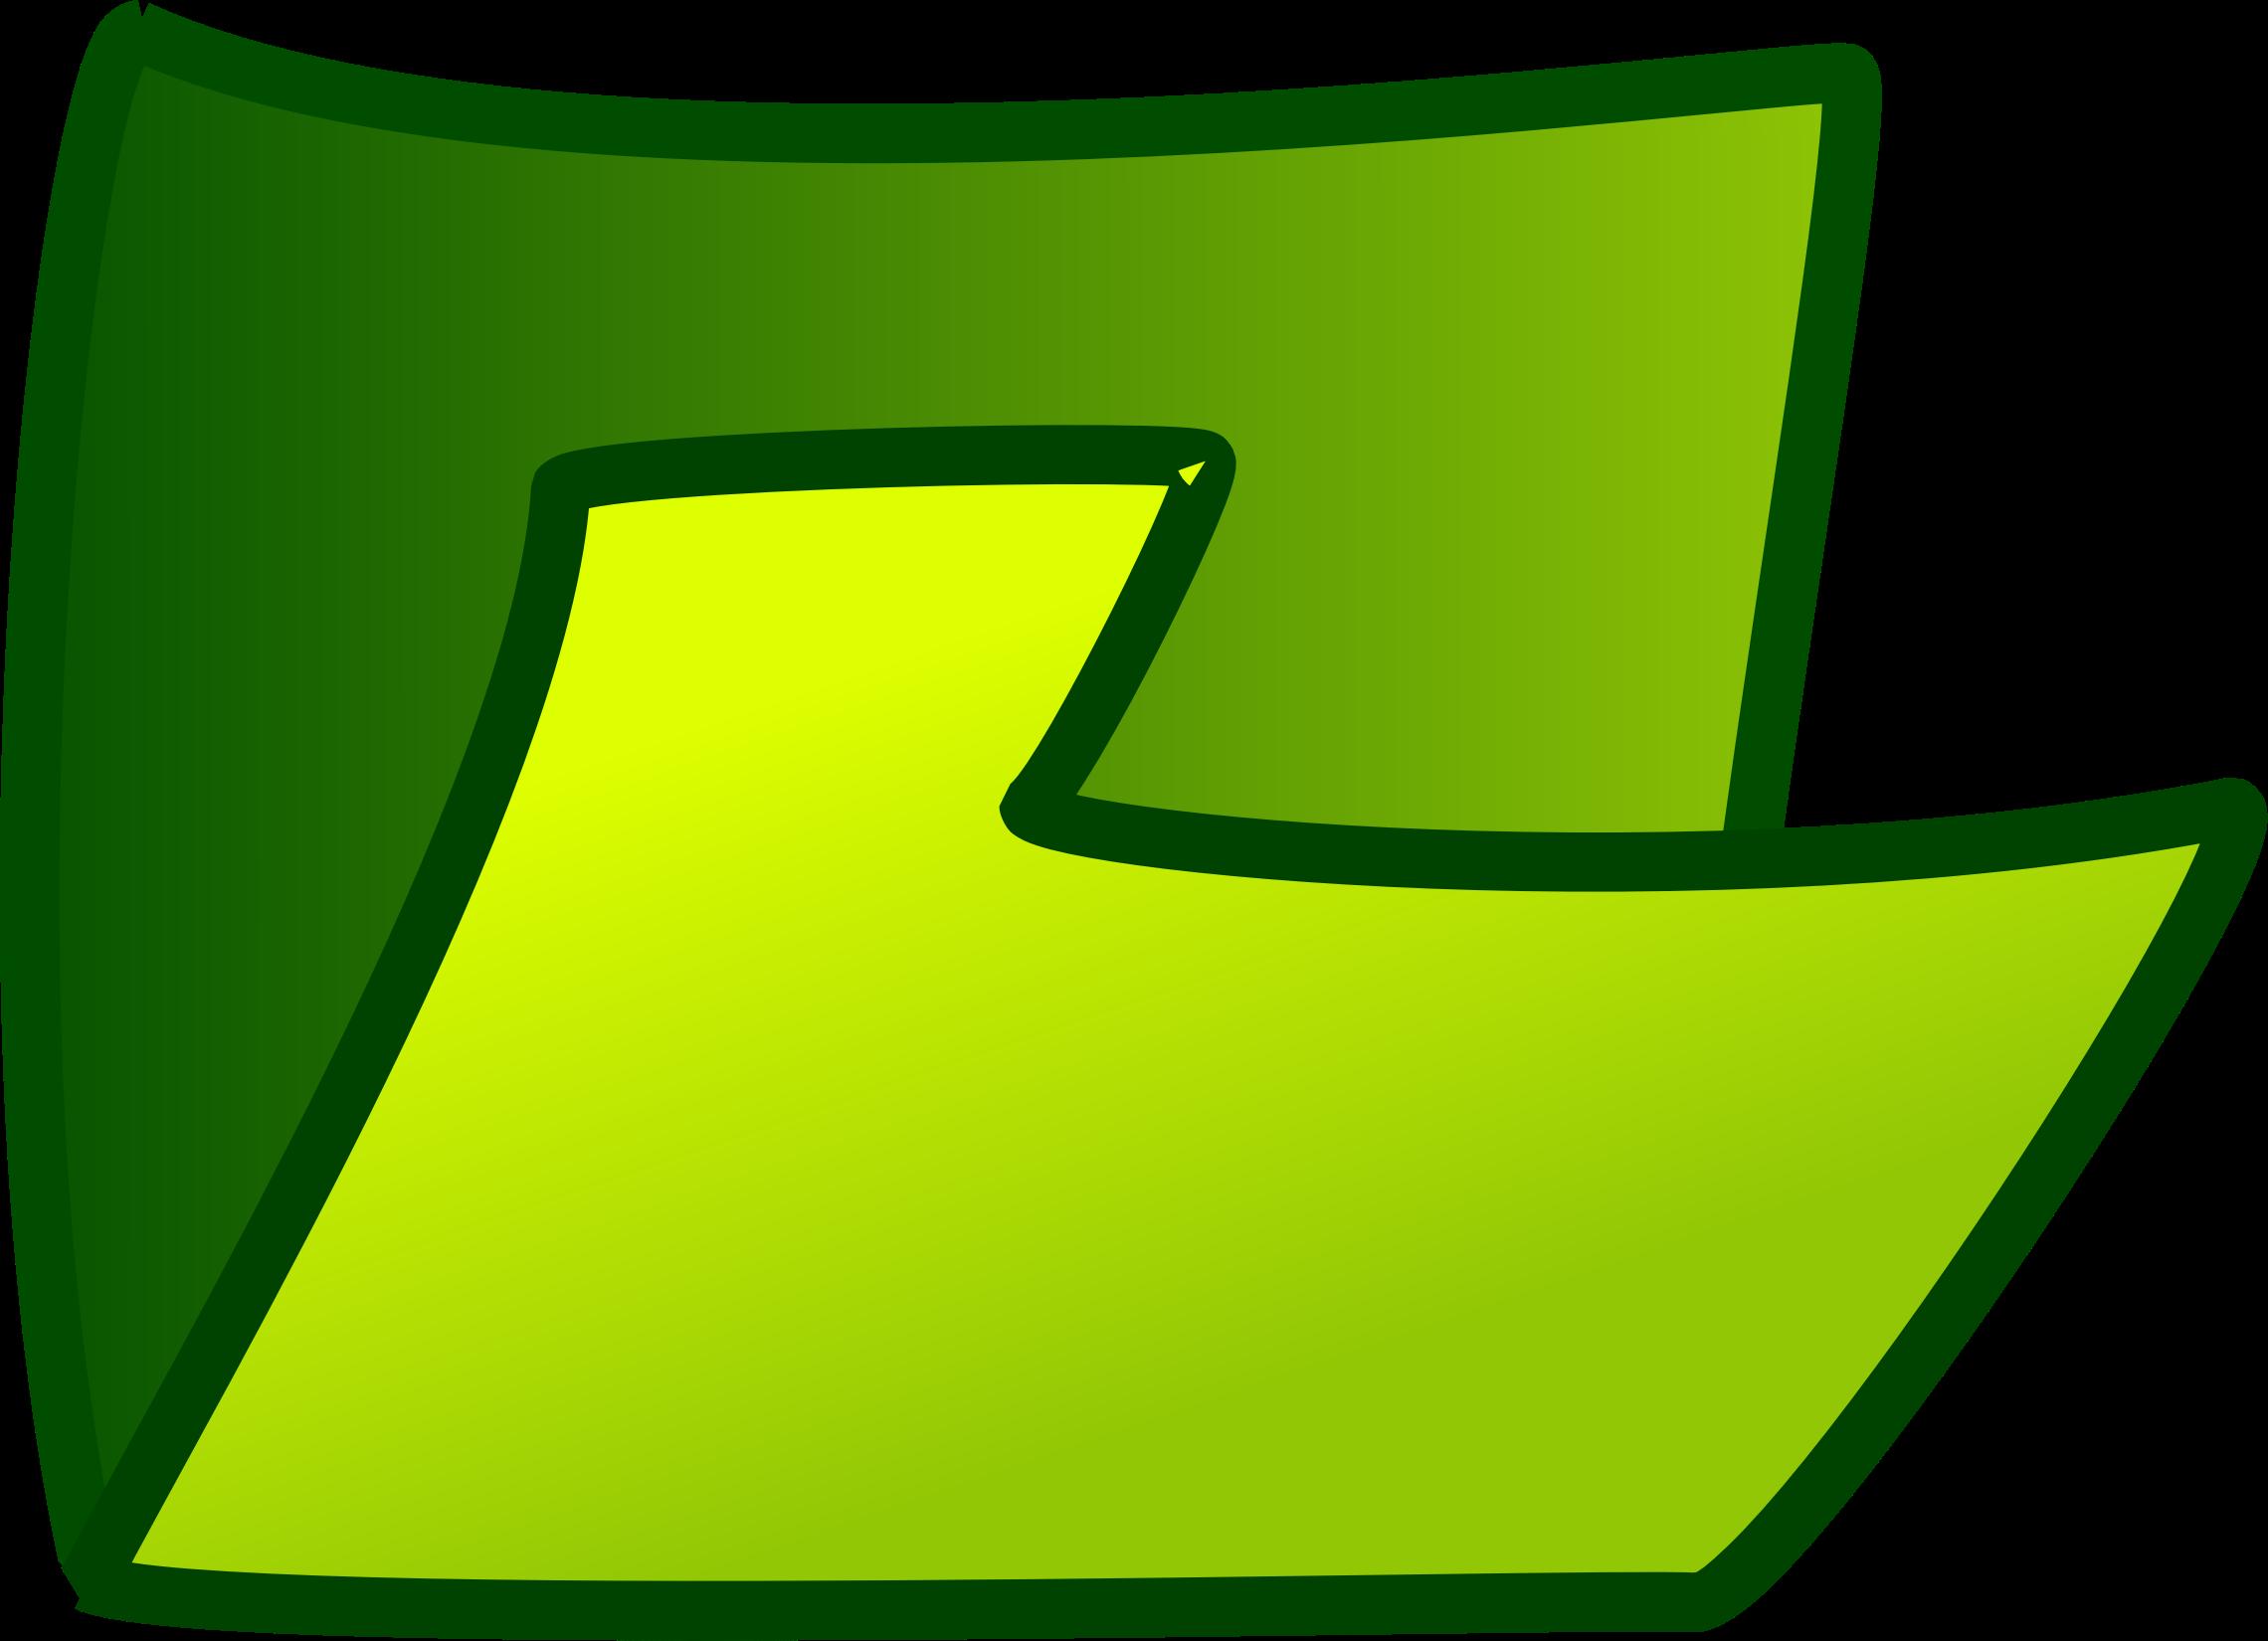 Файл зеленым цветом